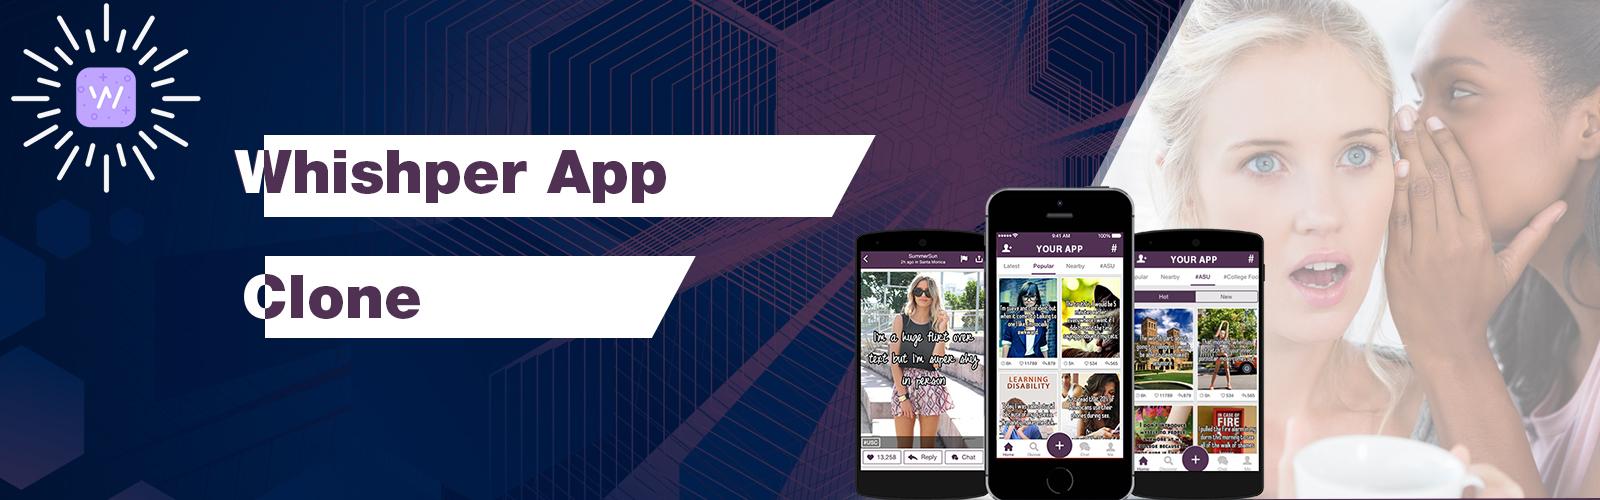 Clone App page